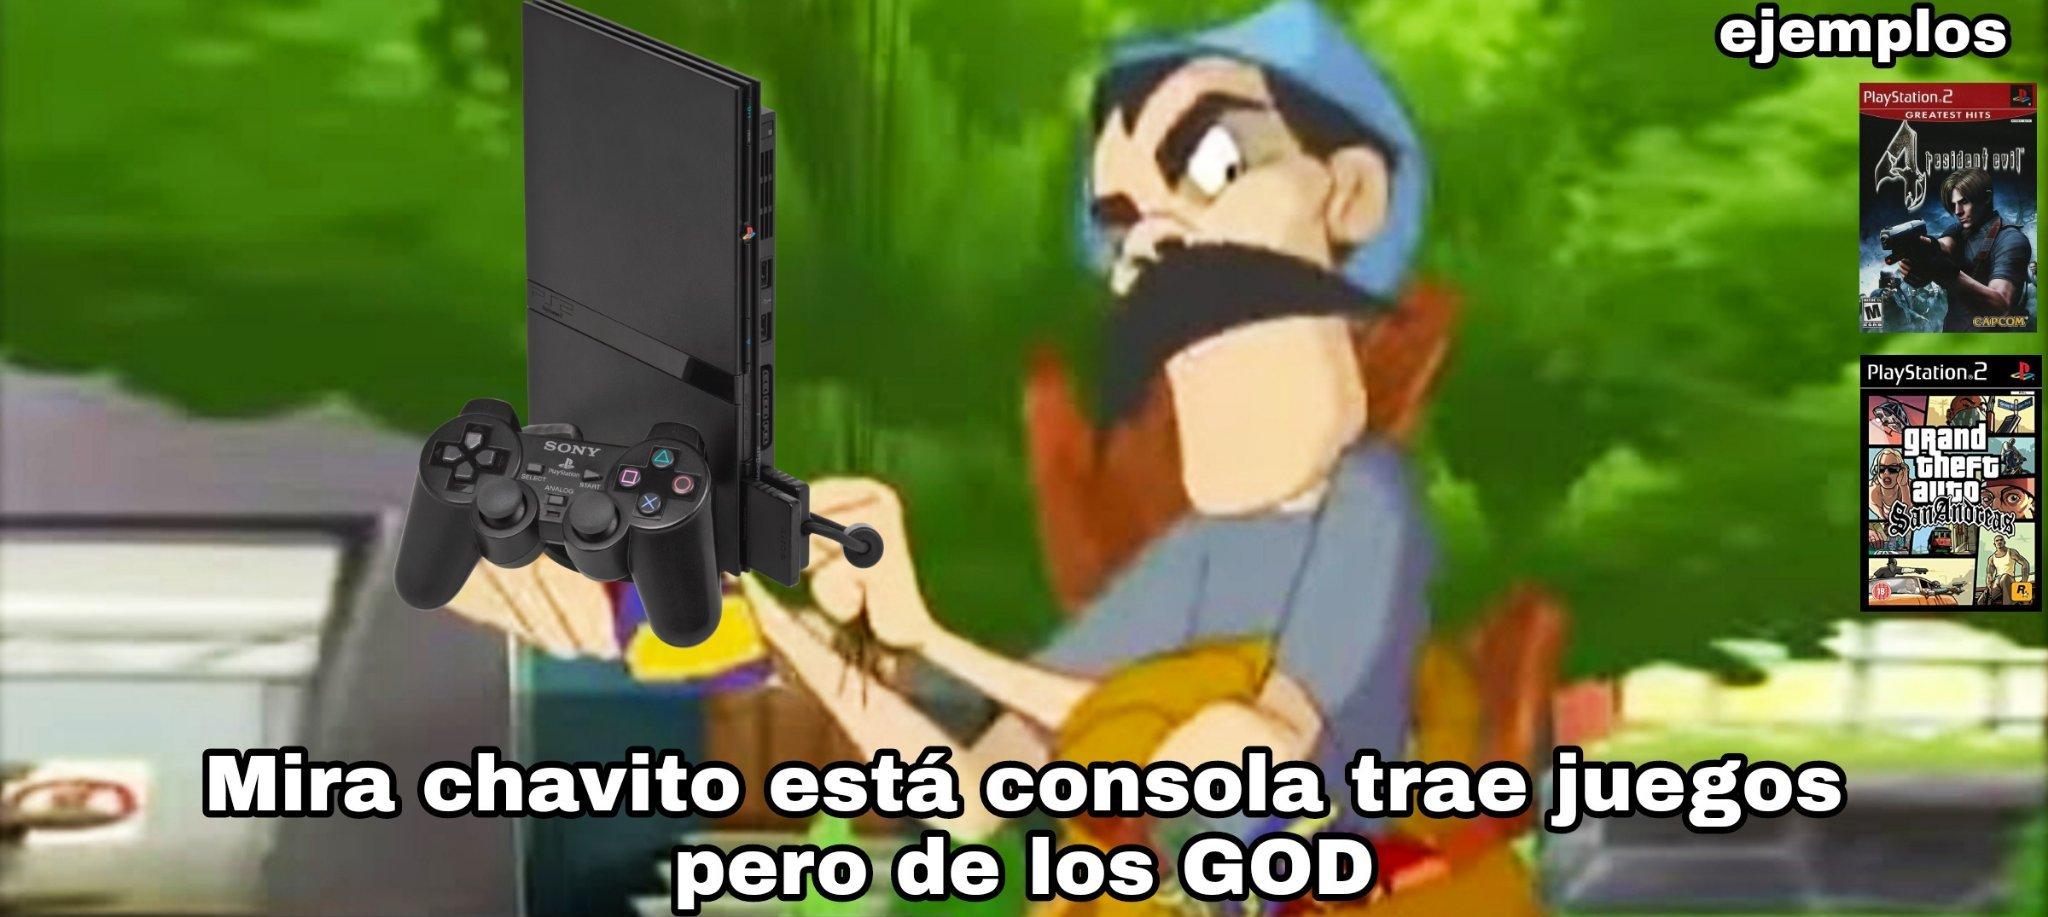 La Gamecube es zzzzzz - meme